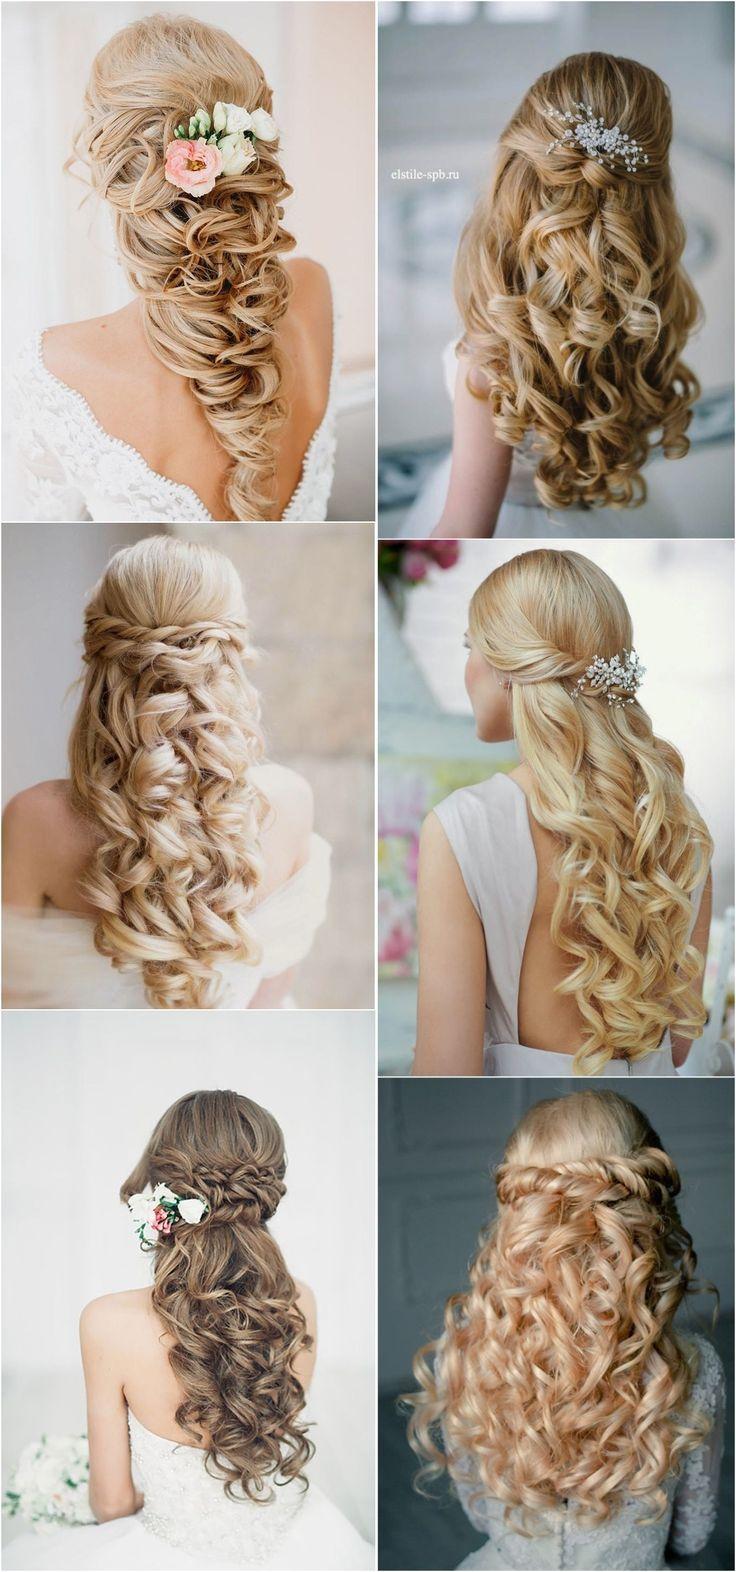 Bridal hairstyles stunning half up half down wedding hairstyles